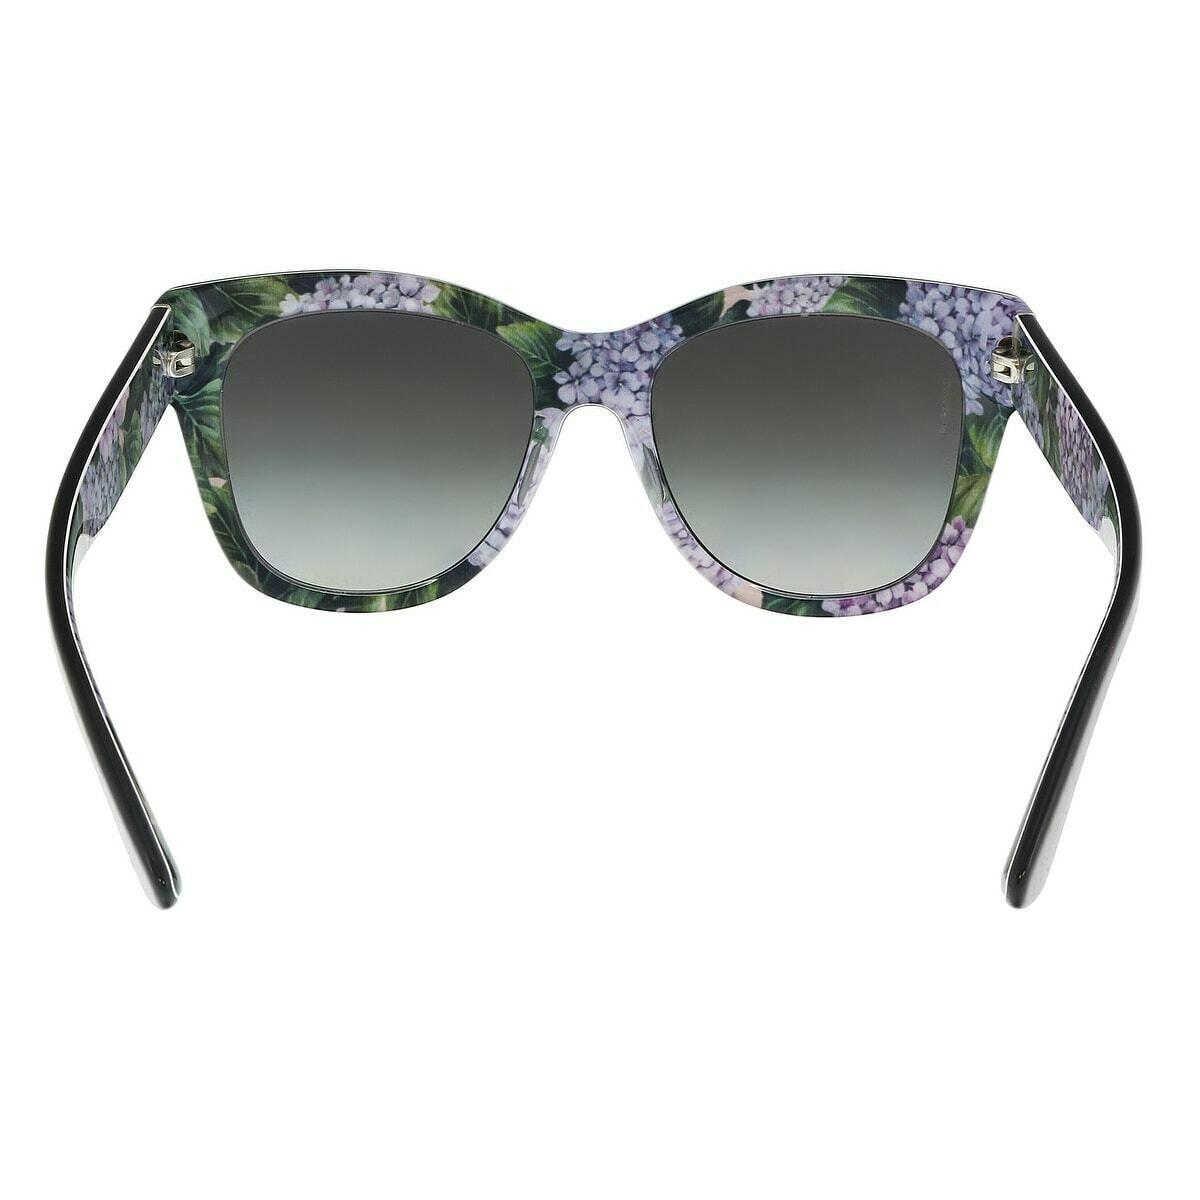 NEW AUTHENTIC Dolce & Gabbana Sunglasses DG4270F 3151/8G Gray Hydrangea